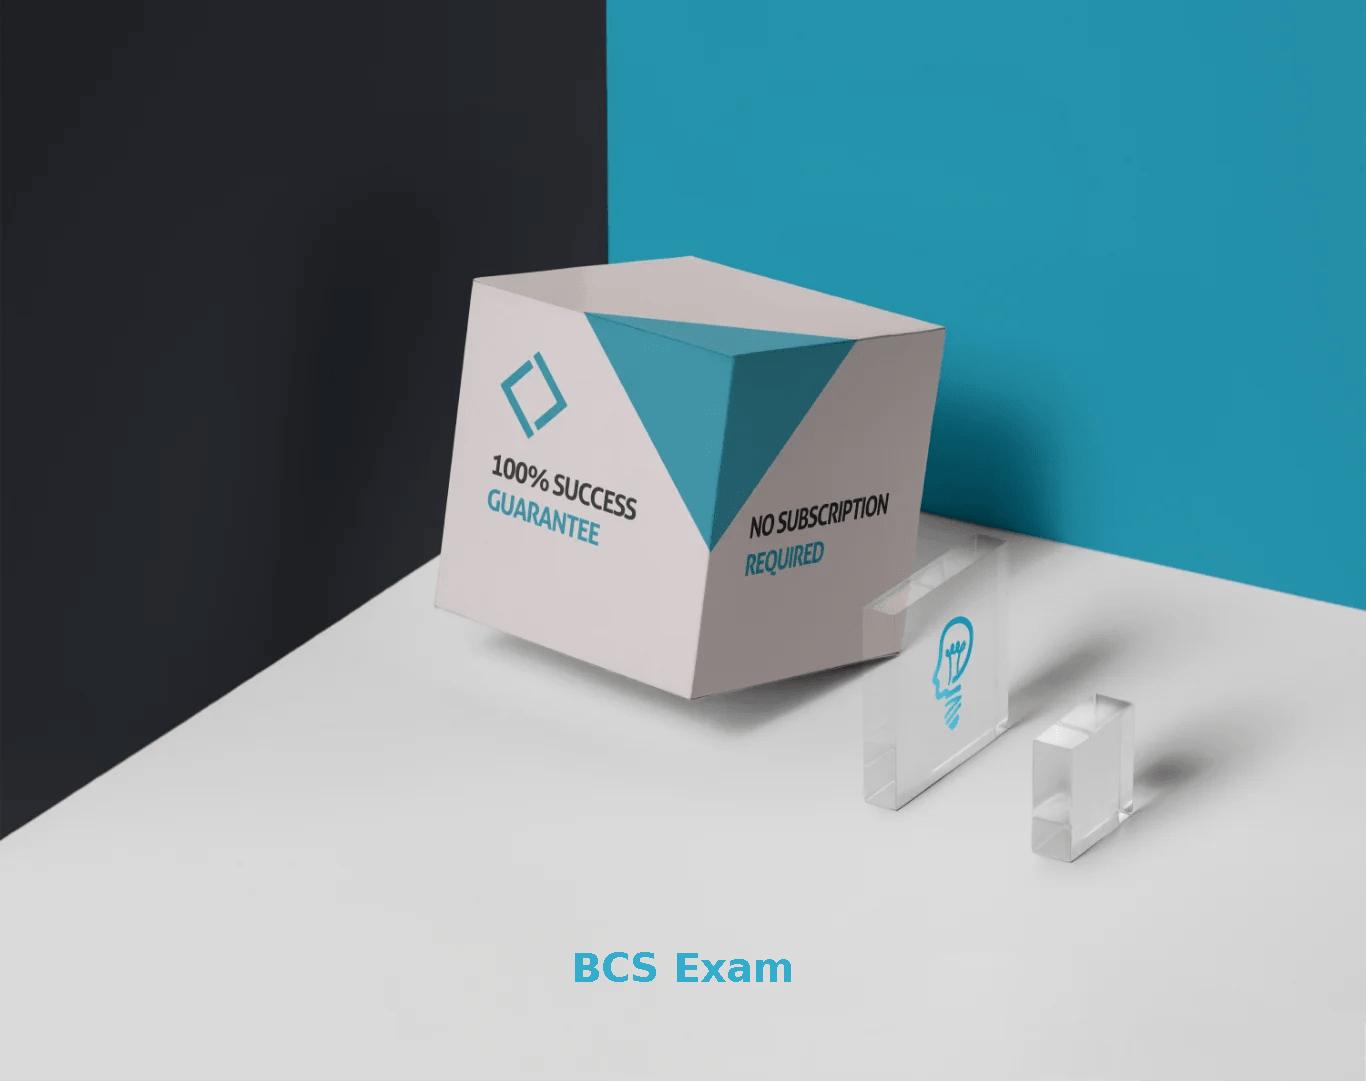 BCS Exam Dumps